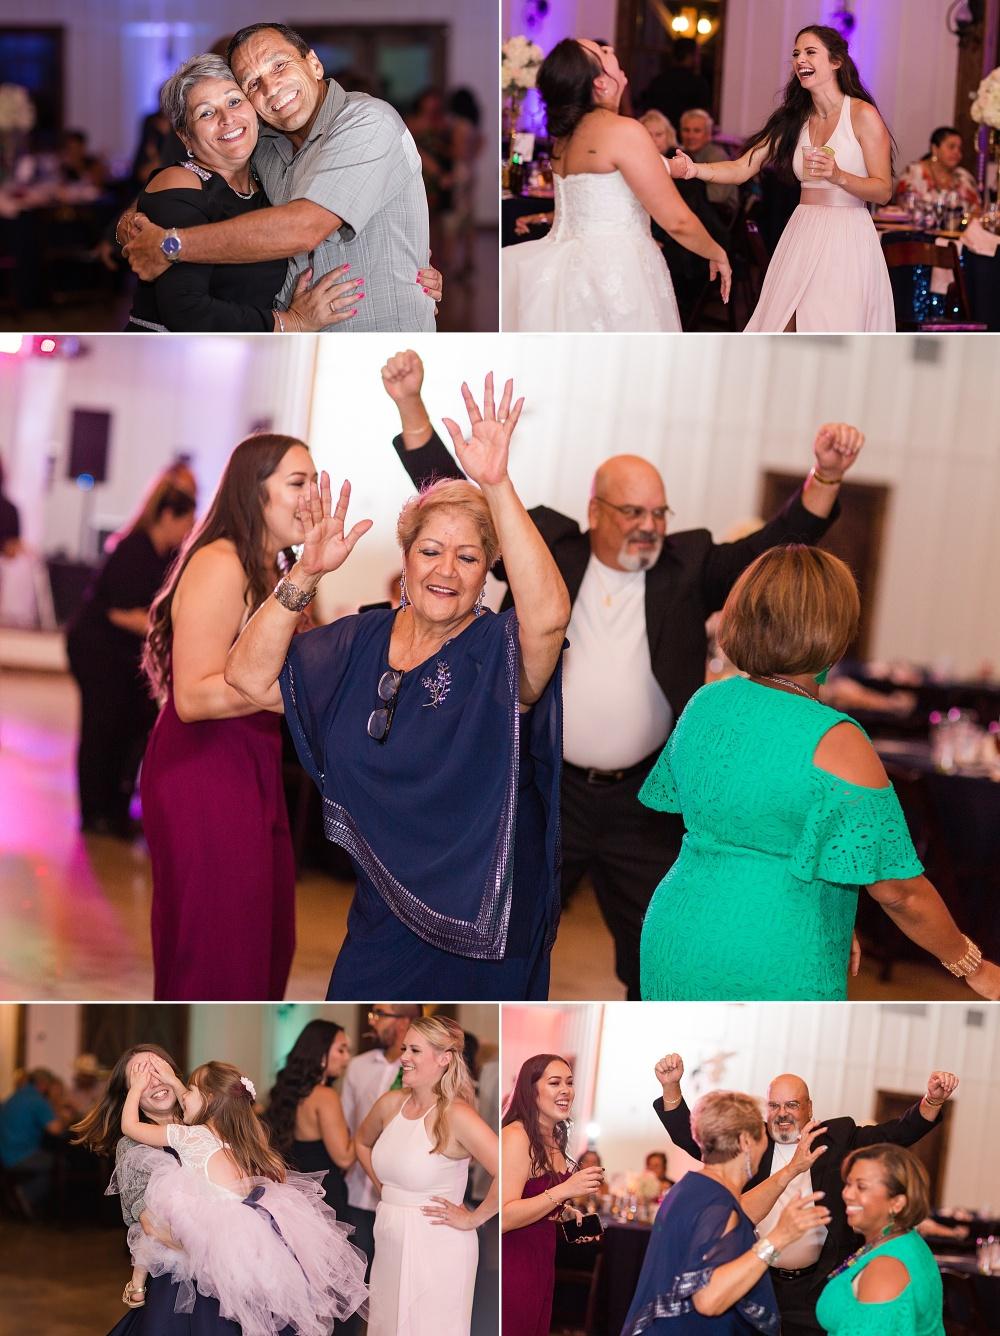 Wedding-Photographer-Bulverde-Texas-Western-Sky-Event-Venue-Carly-Barton-Photography_0085.jpg